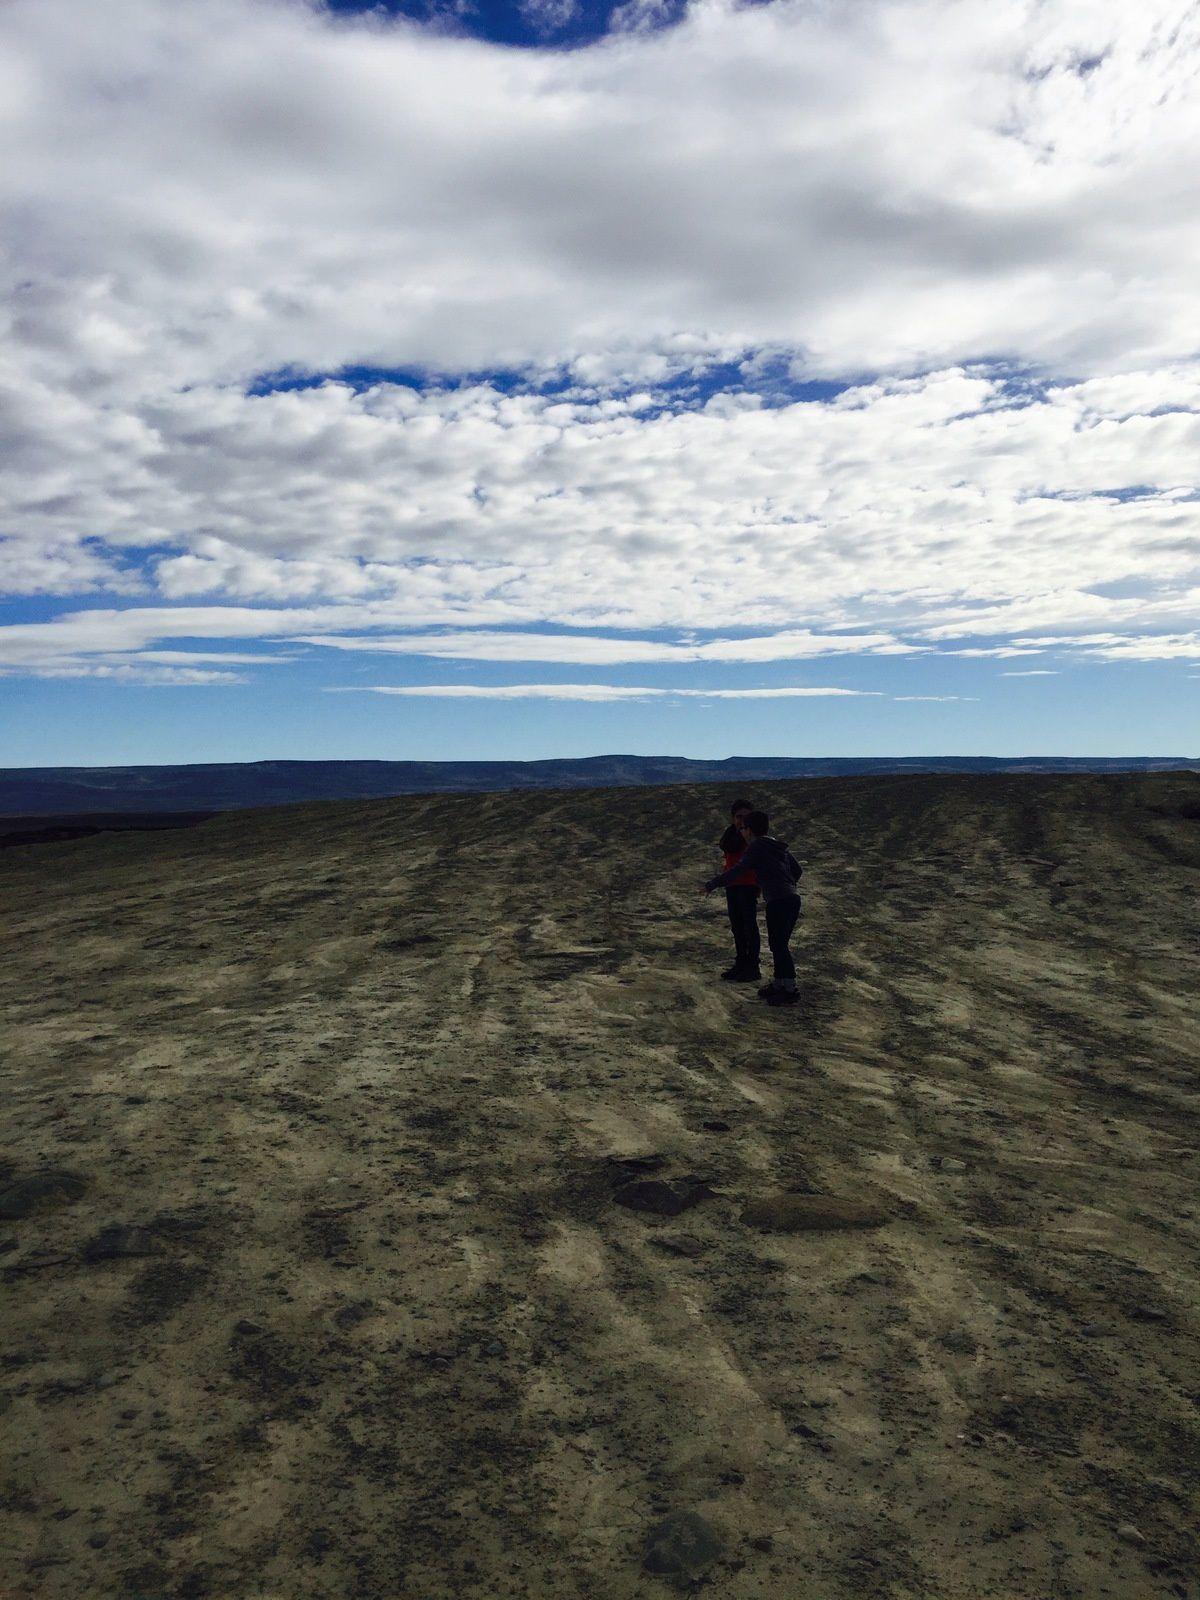 Le cerro Fitz Roy